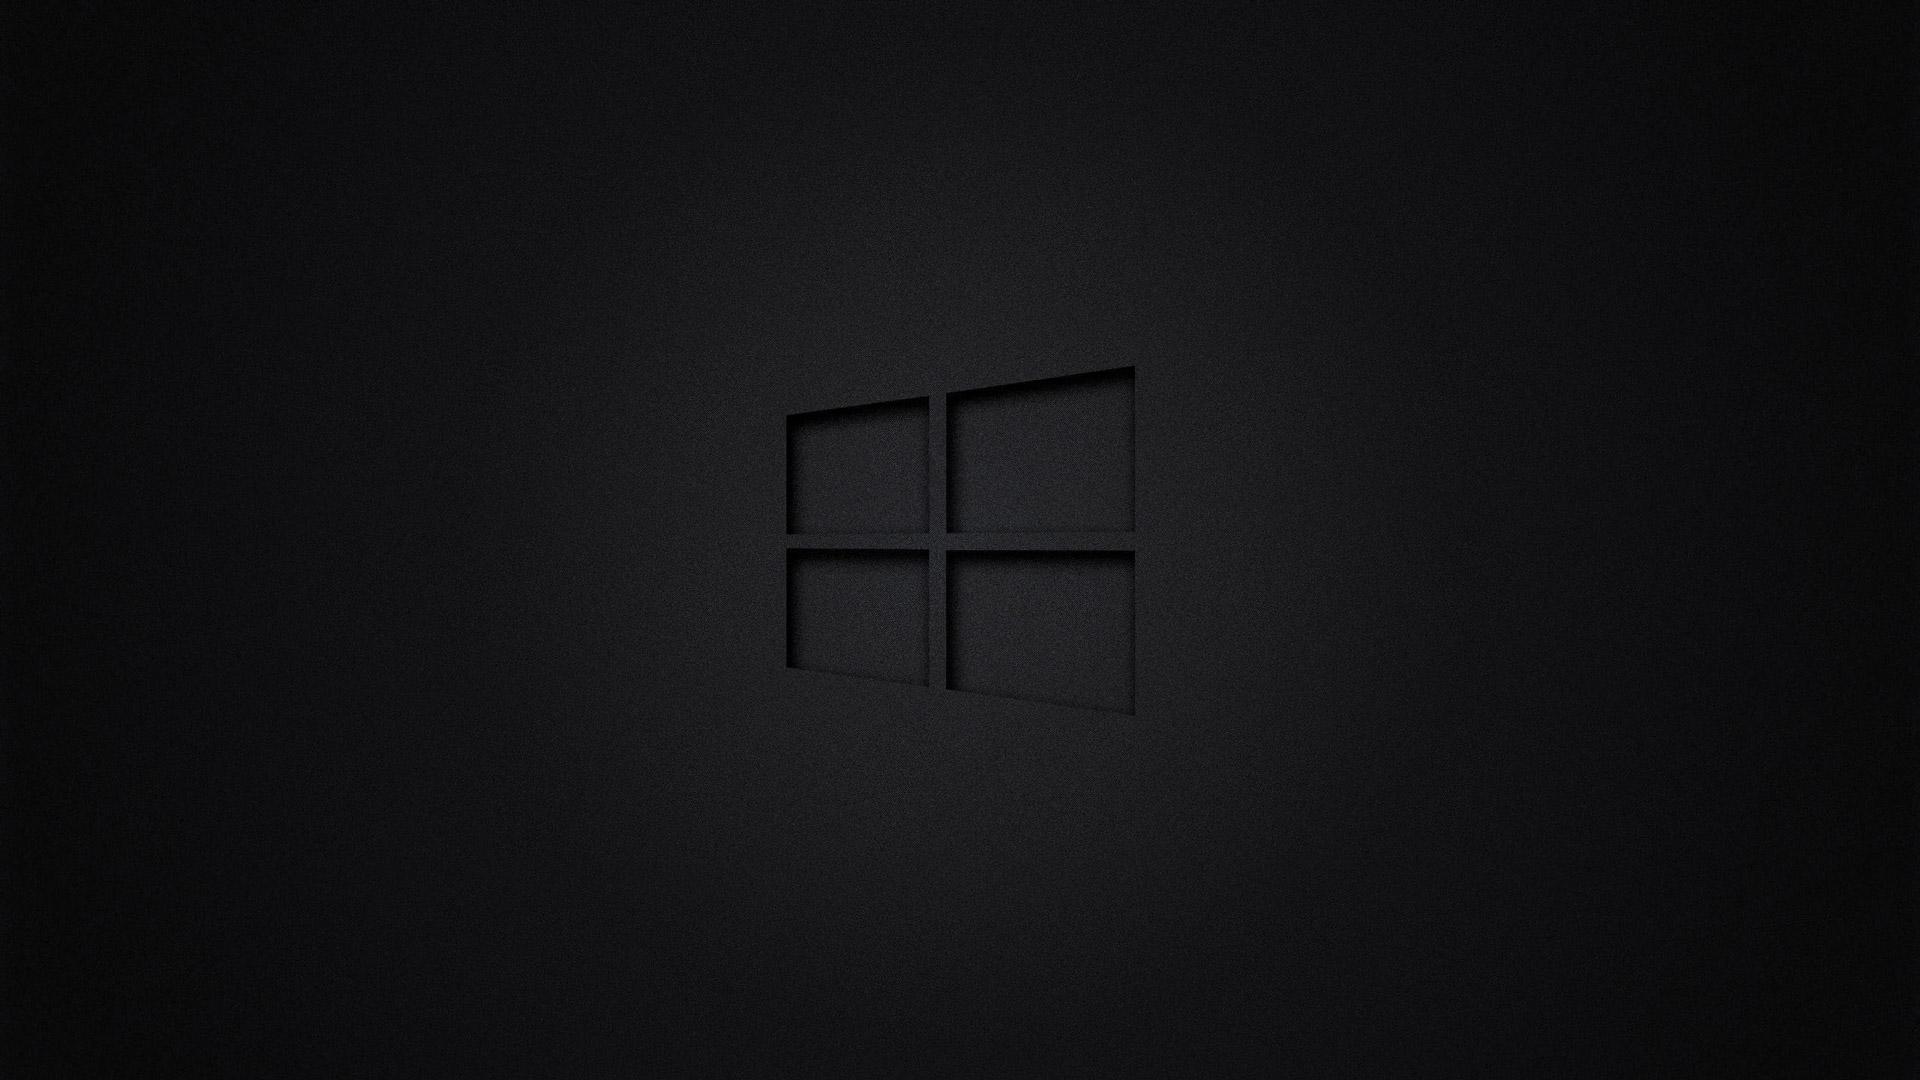 1280x1024 Windows 10 Dark 1280x1024 Resolution Hd 4k